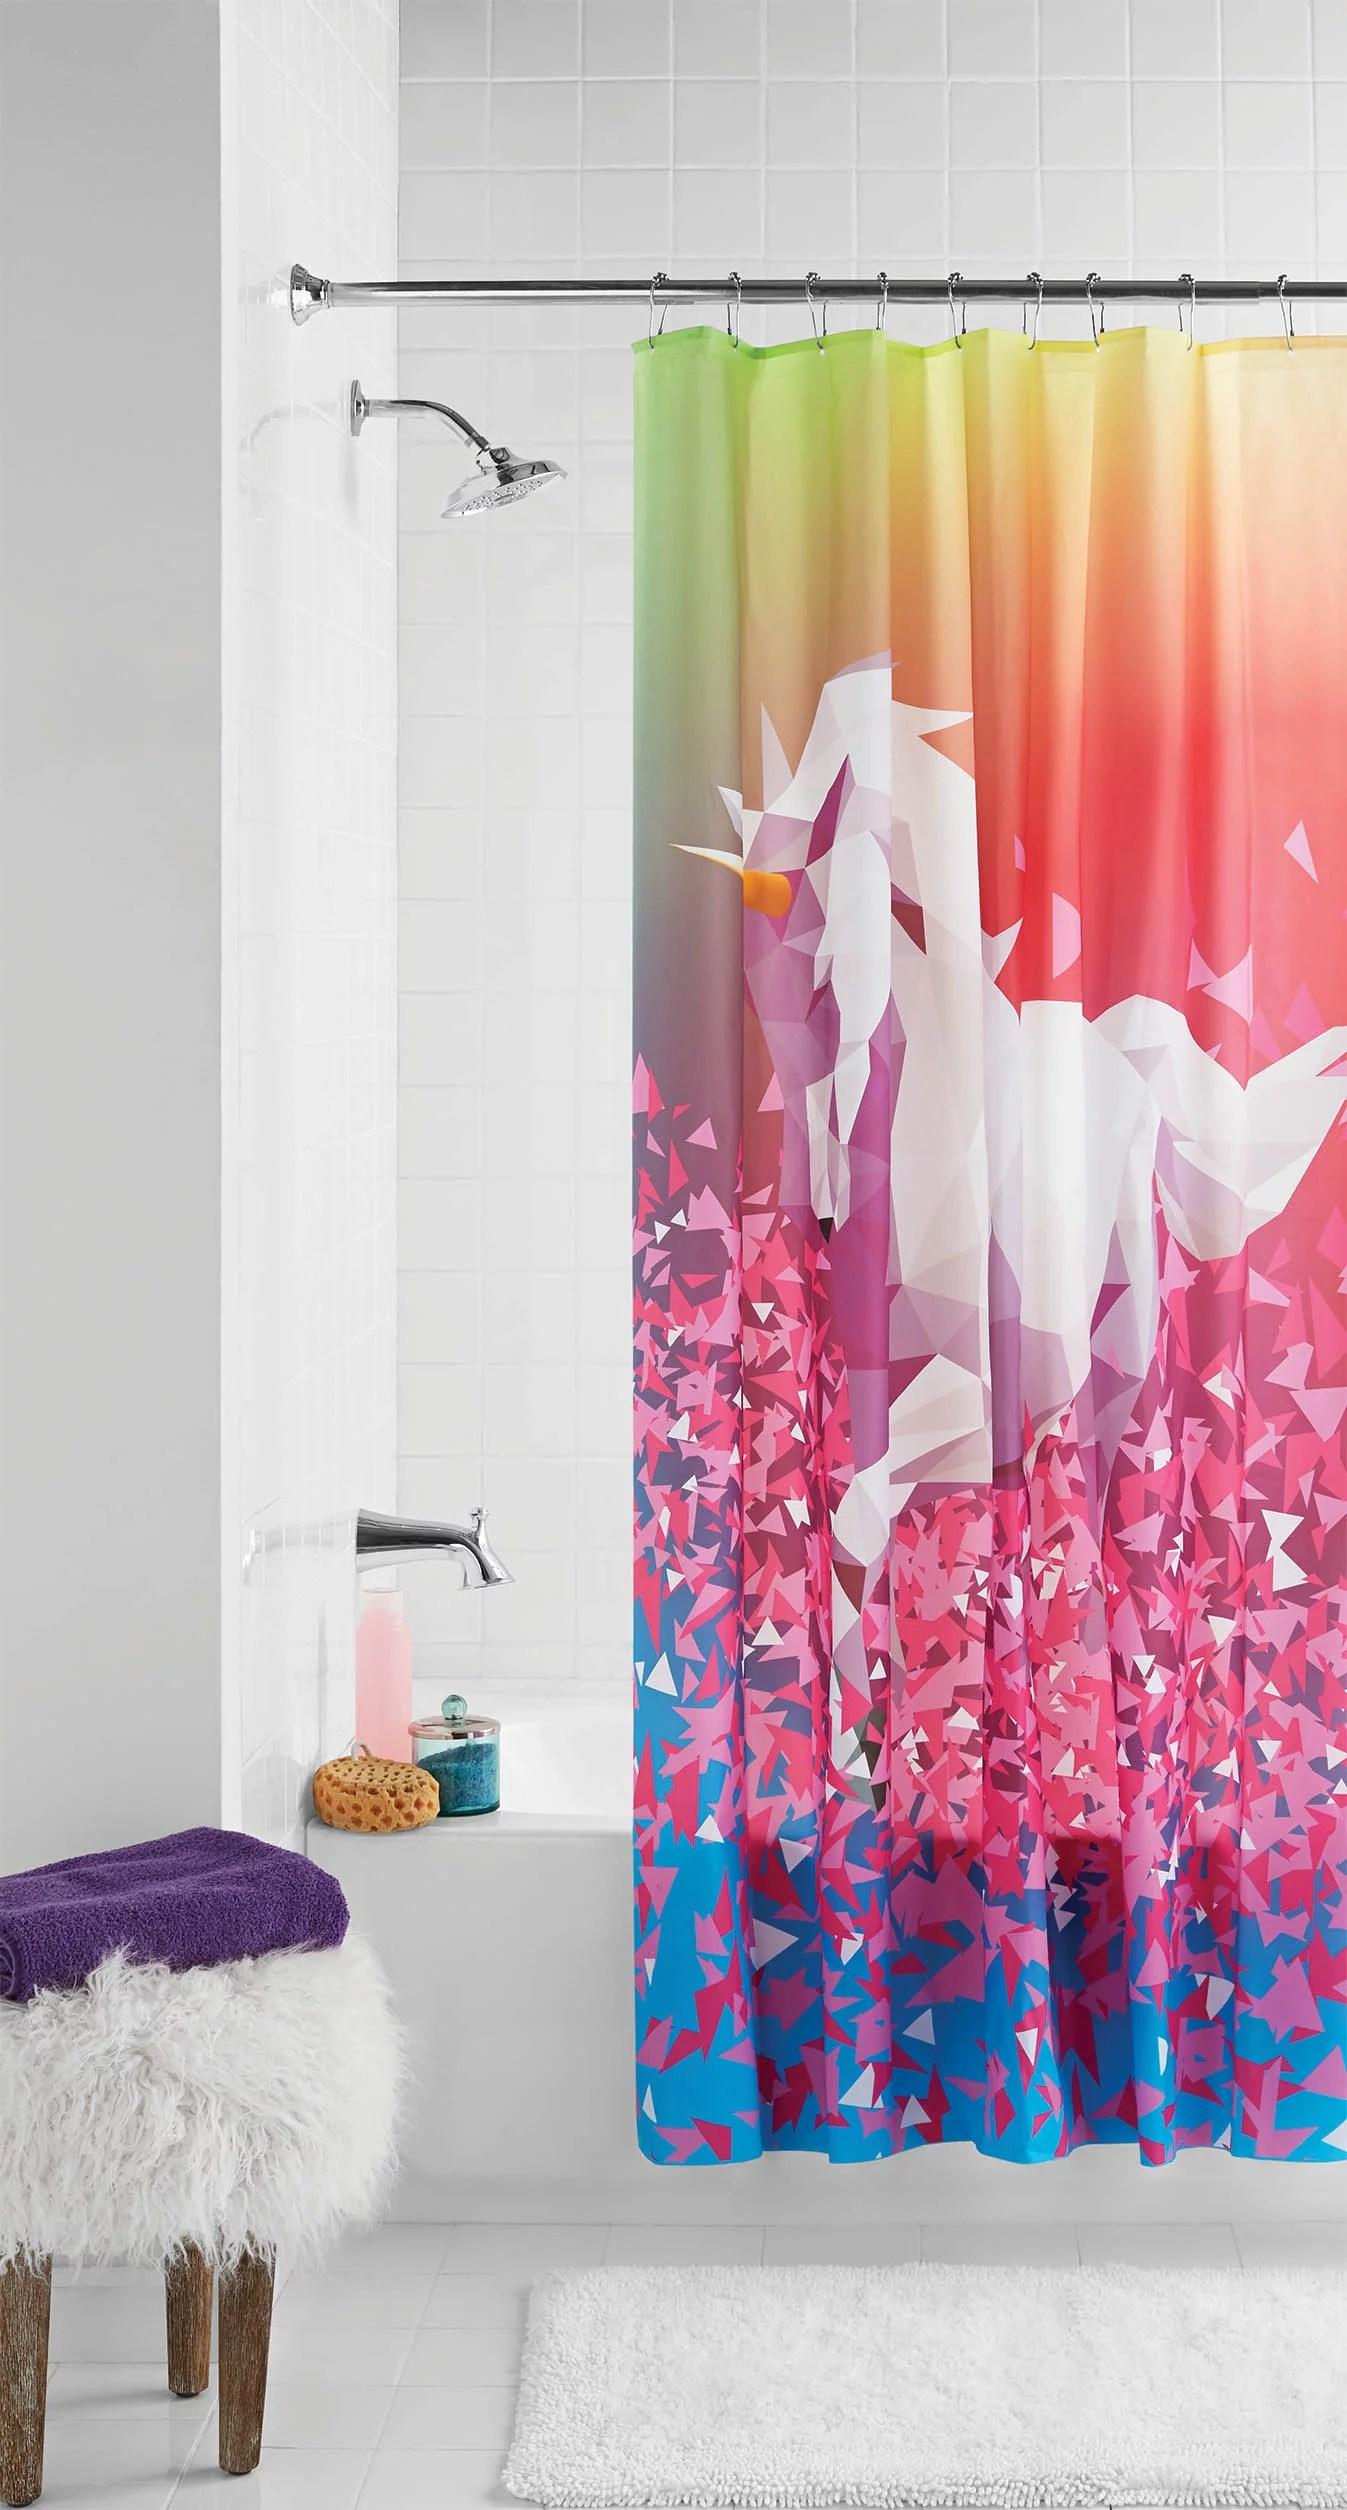 mainstays glitter unicorn shower curtain 70 x 72 walmart com